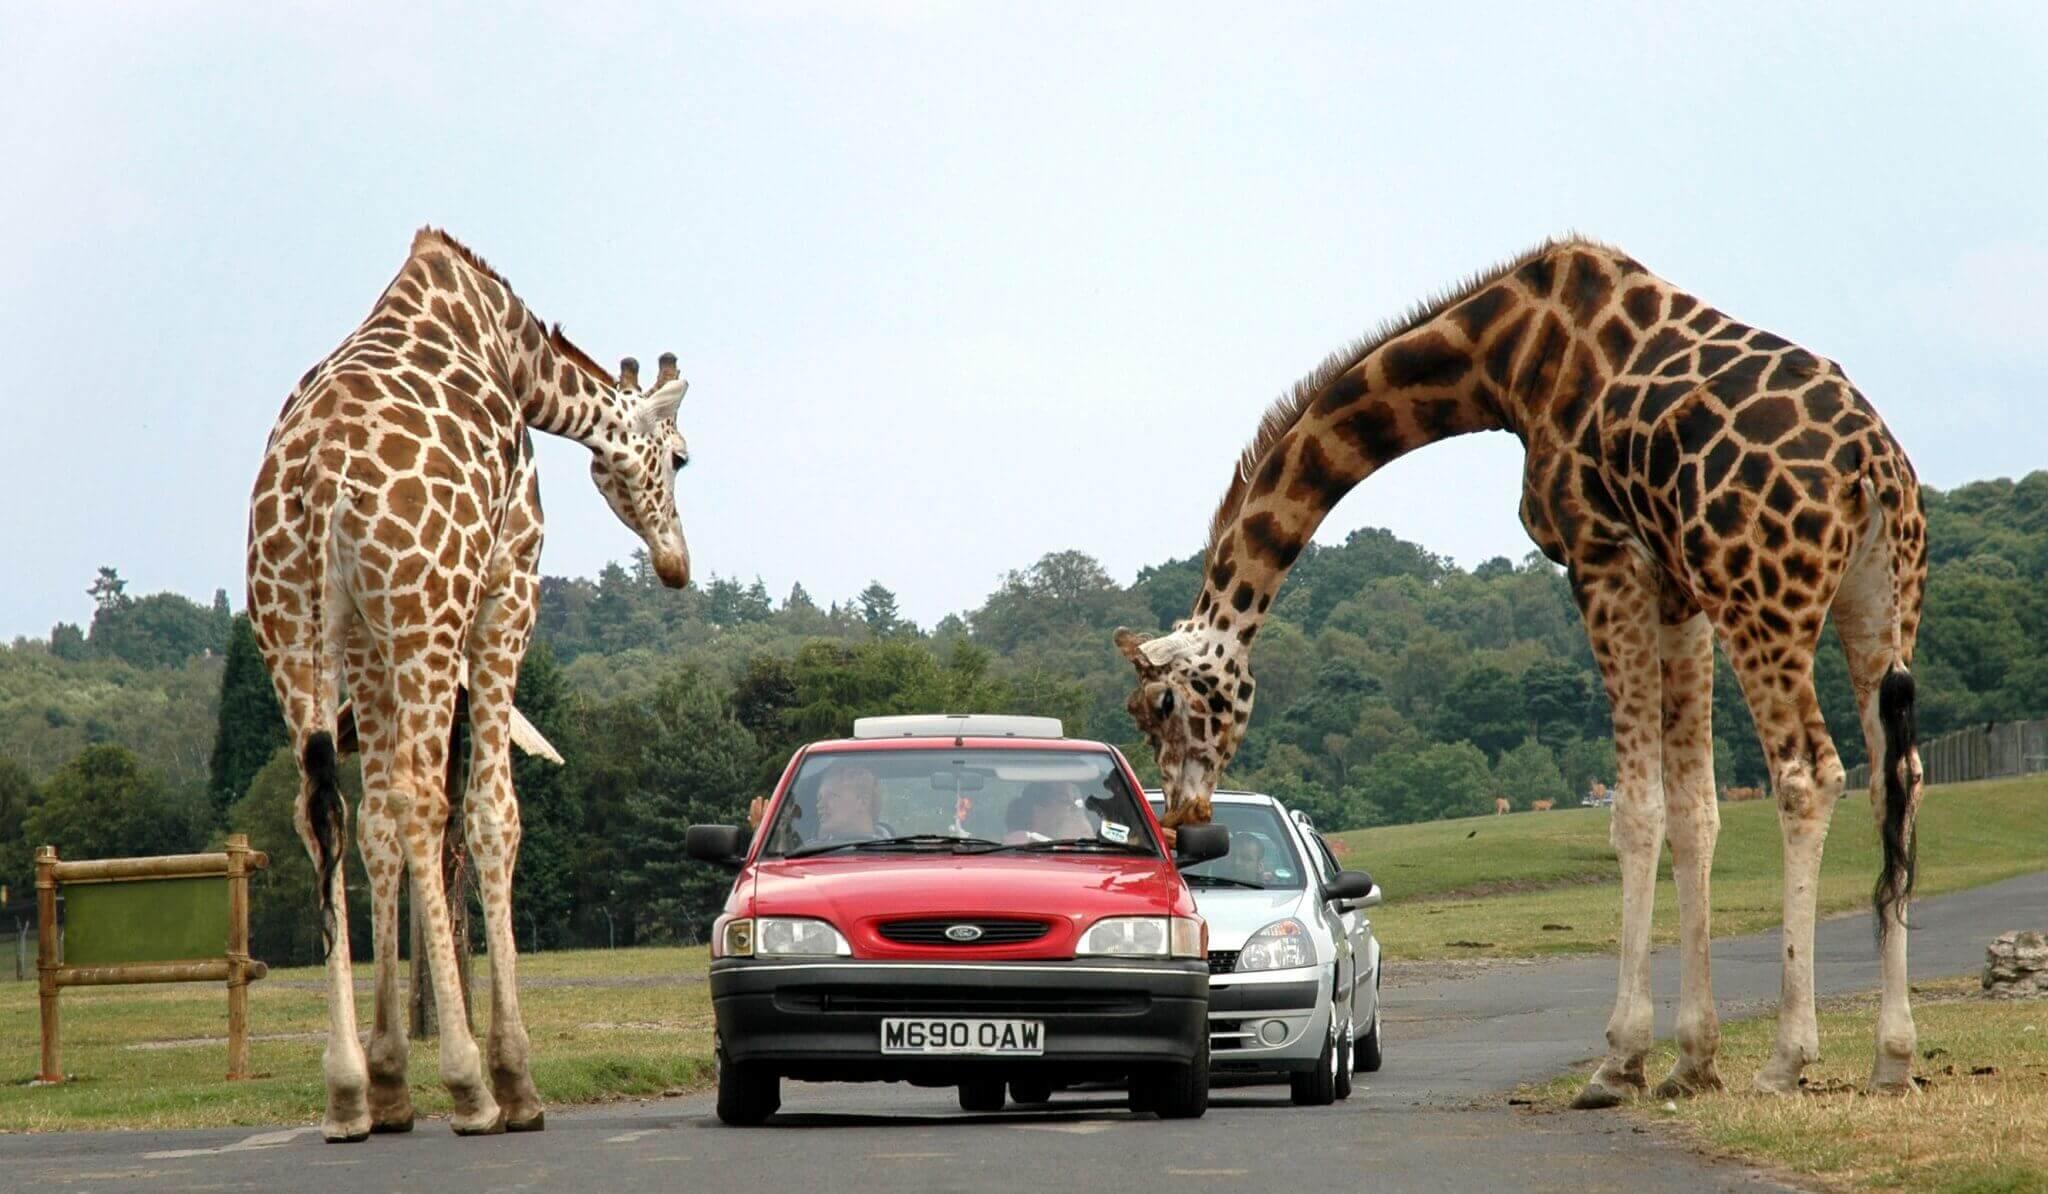 Giraffes_at_west_midlands_safari_park